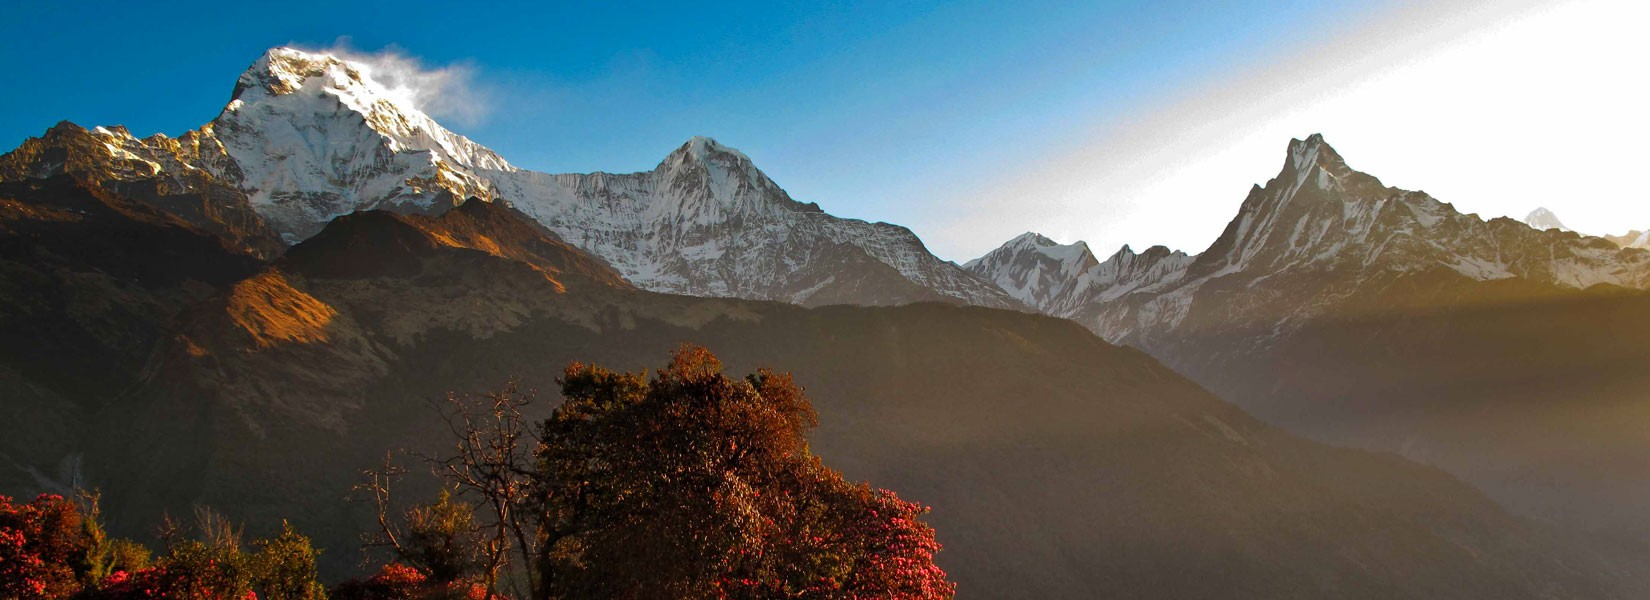 View of Annapurna South, Hiuchuli and Machhapuchhre from Tadapani in Ghorepani Poon Hill Trek